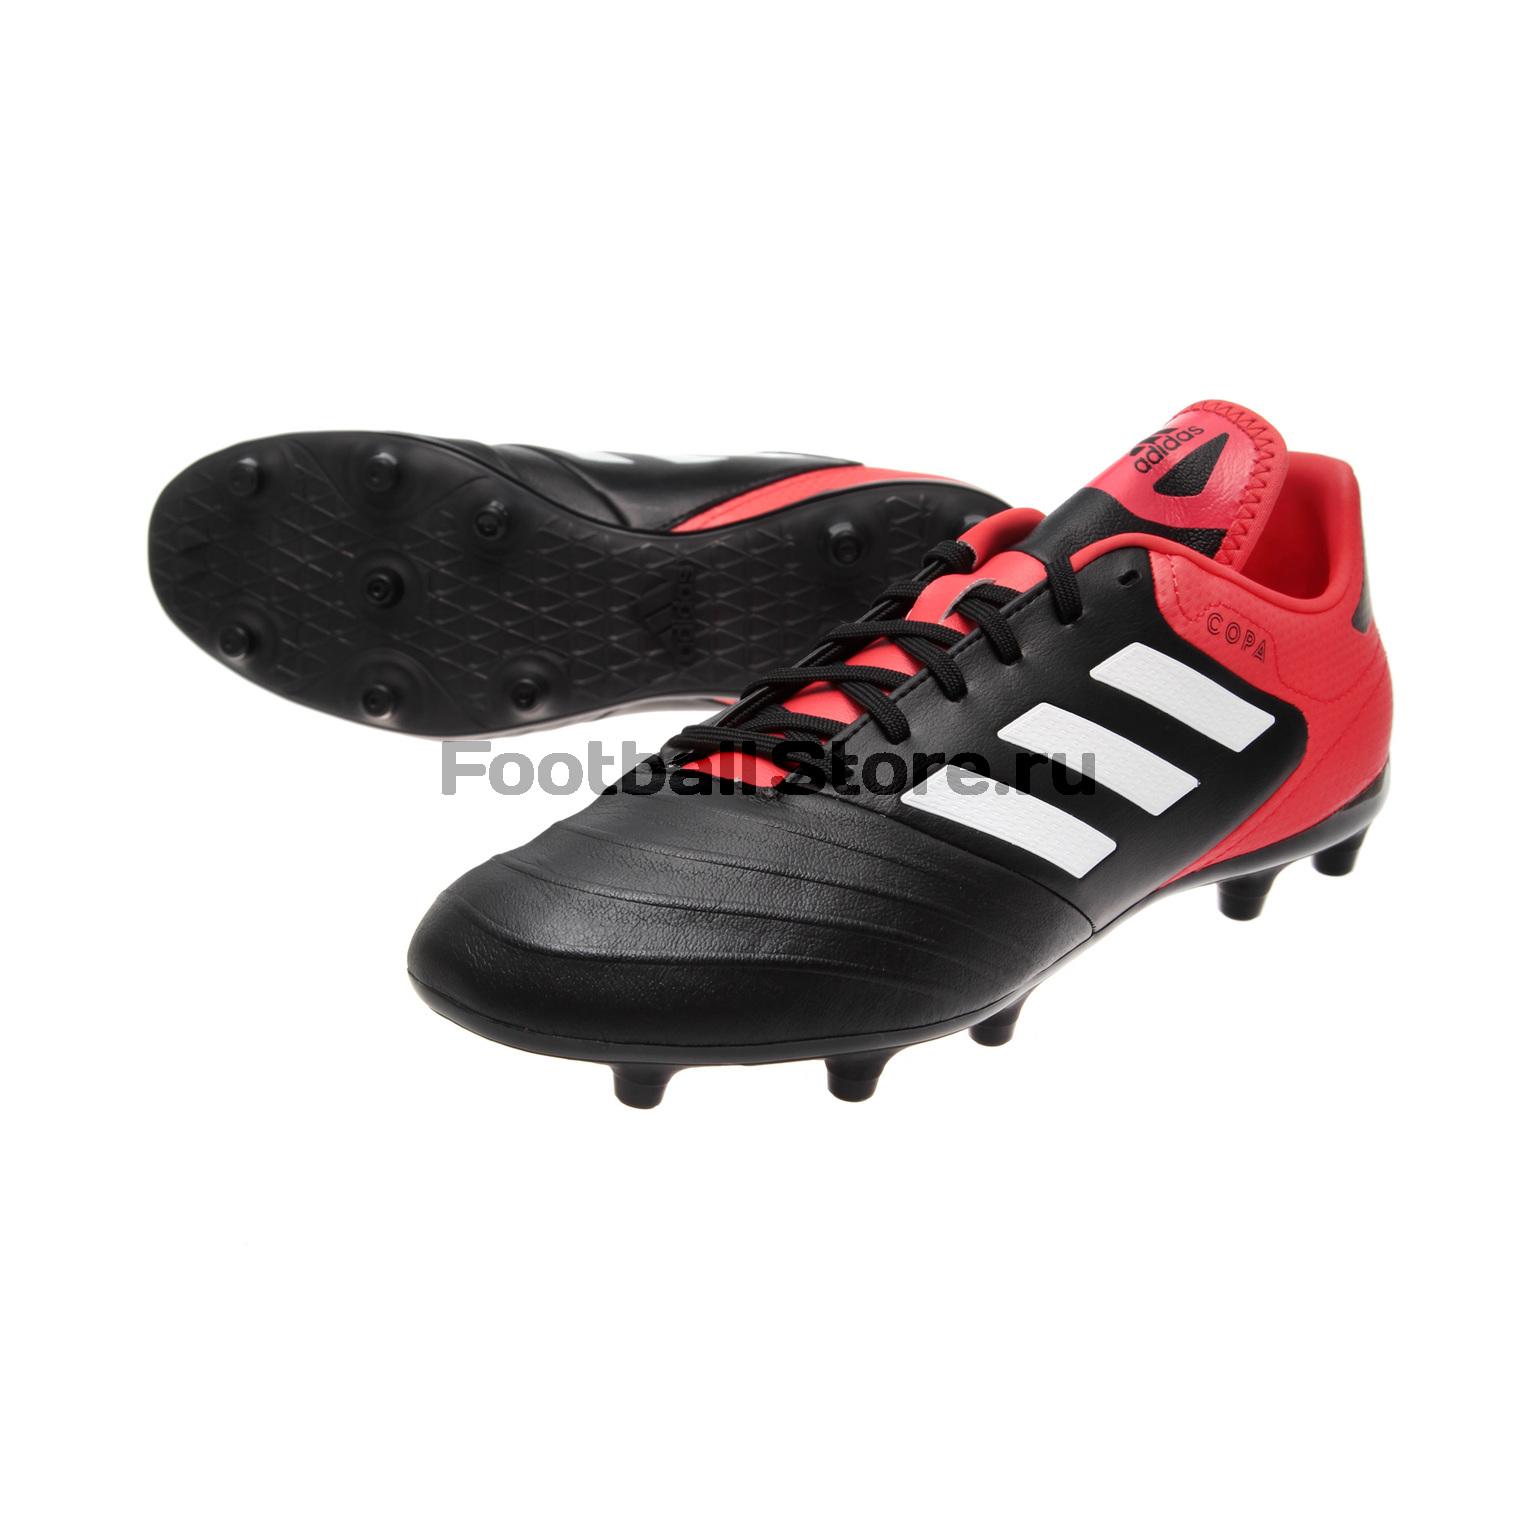 Бутсы Adidas Copa 18.3 FG CP8957 бутсы adidas x 17 1 fg bb6353